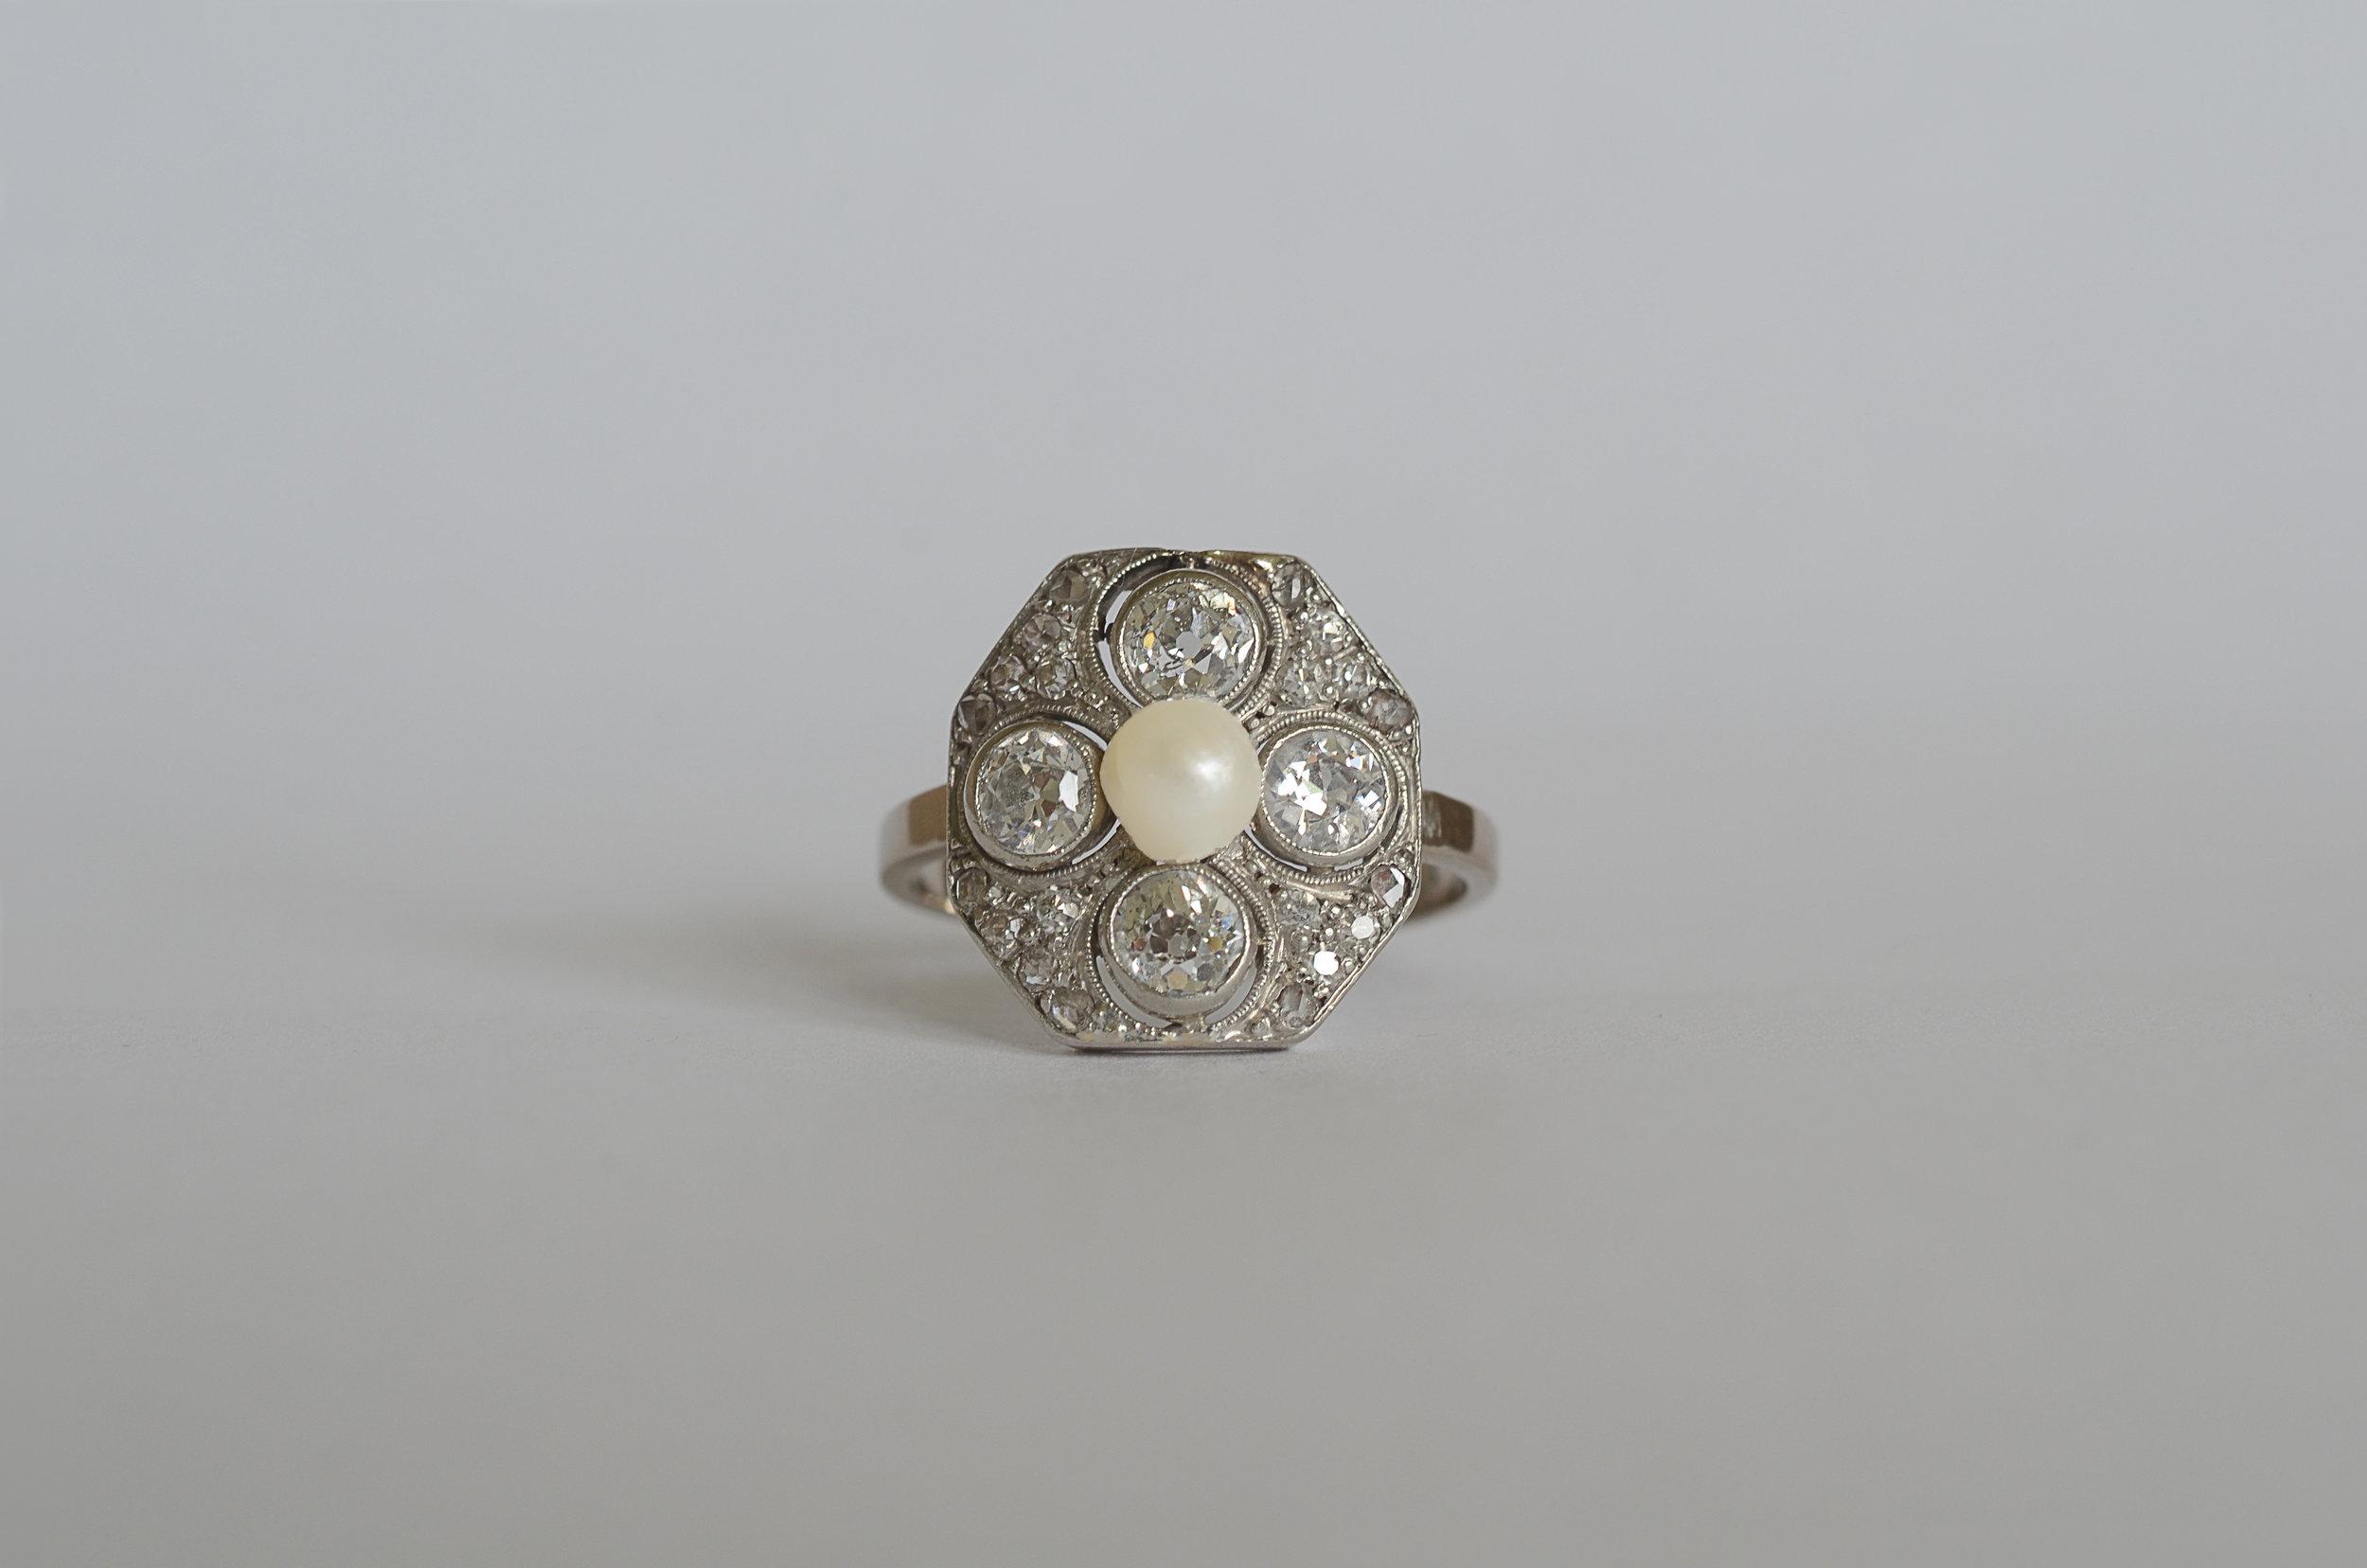 Antique Diamond and Pearl Ring set in Platinum